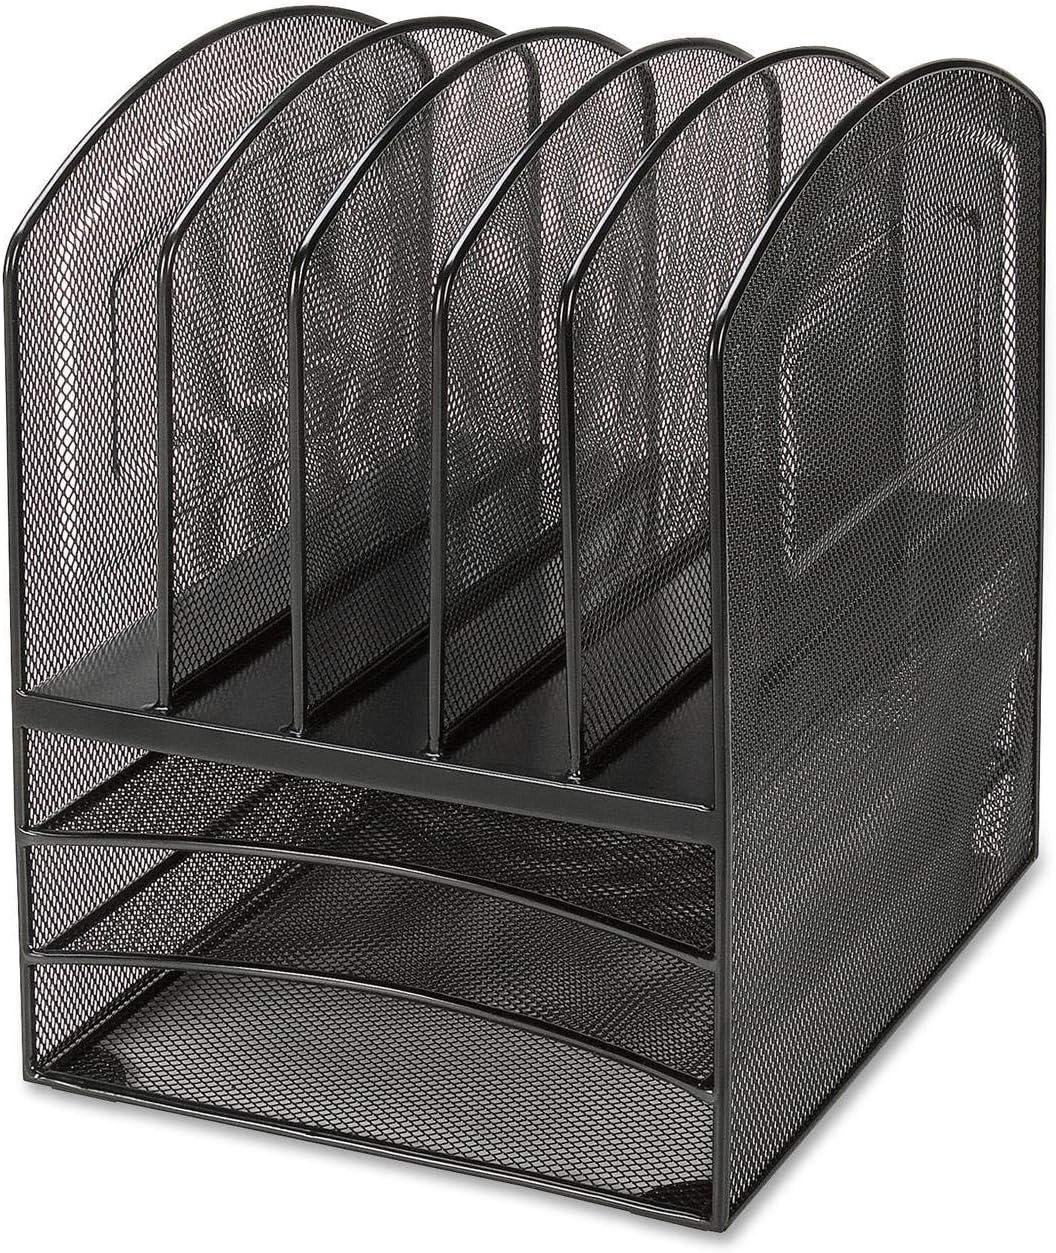 Lorell 95255 Desk Organizer,5-Vert./3-Horz,9-1/2-Inch x11-3/8-Inch x13-Inch,Black Mesh